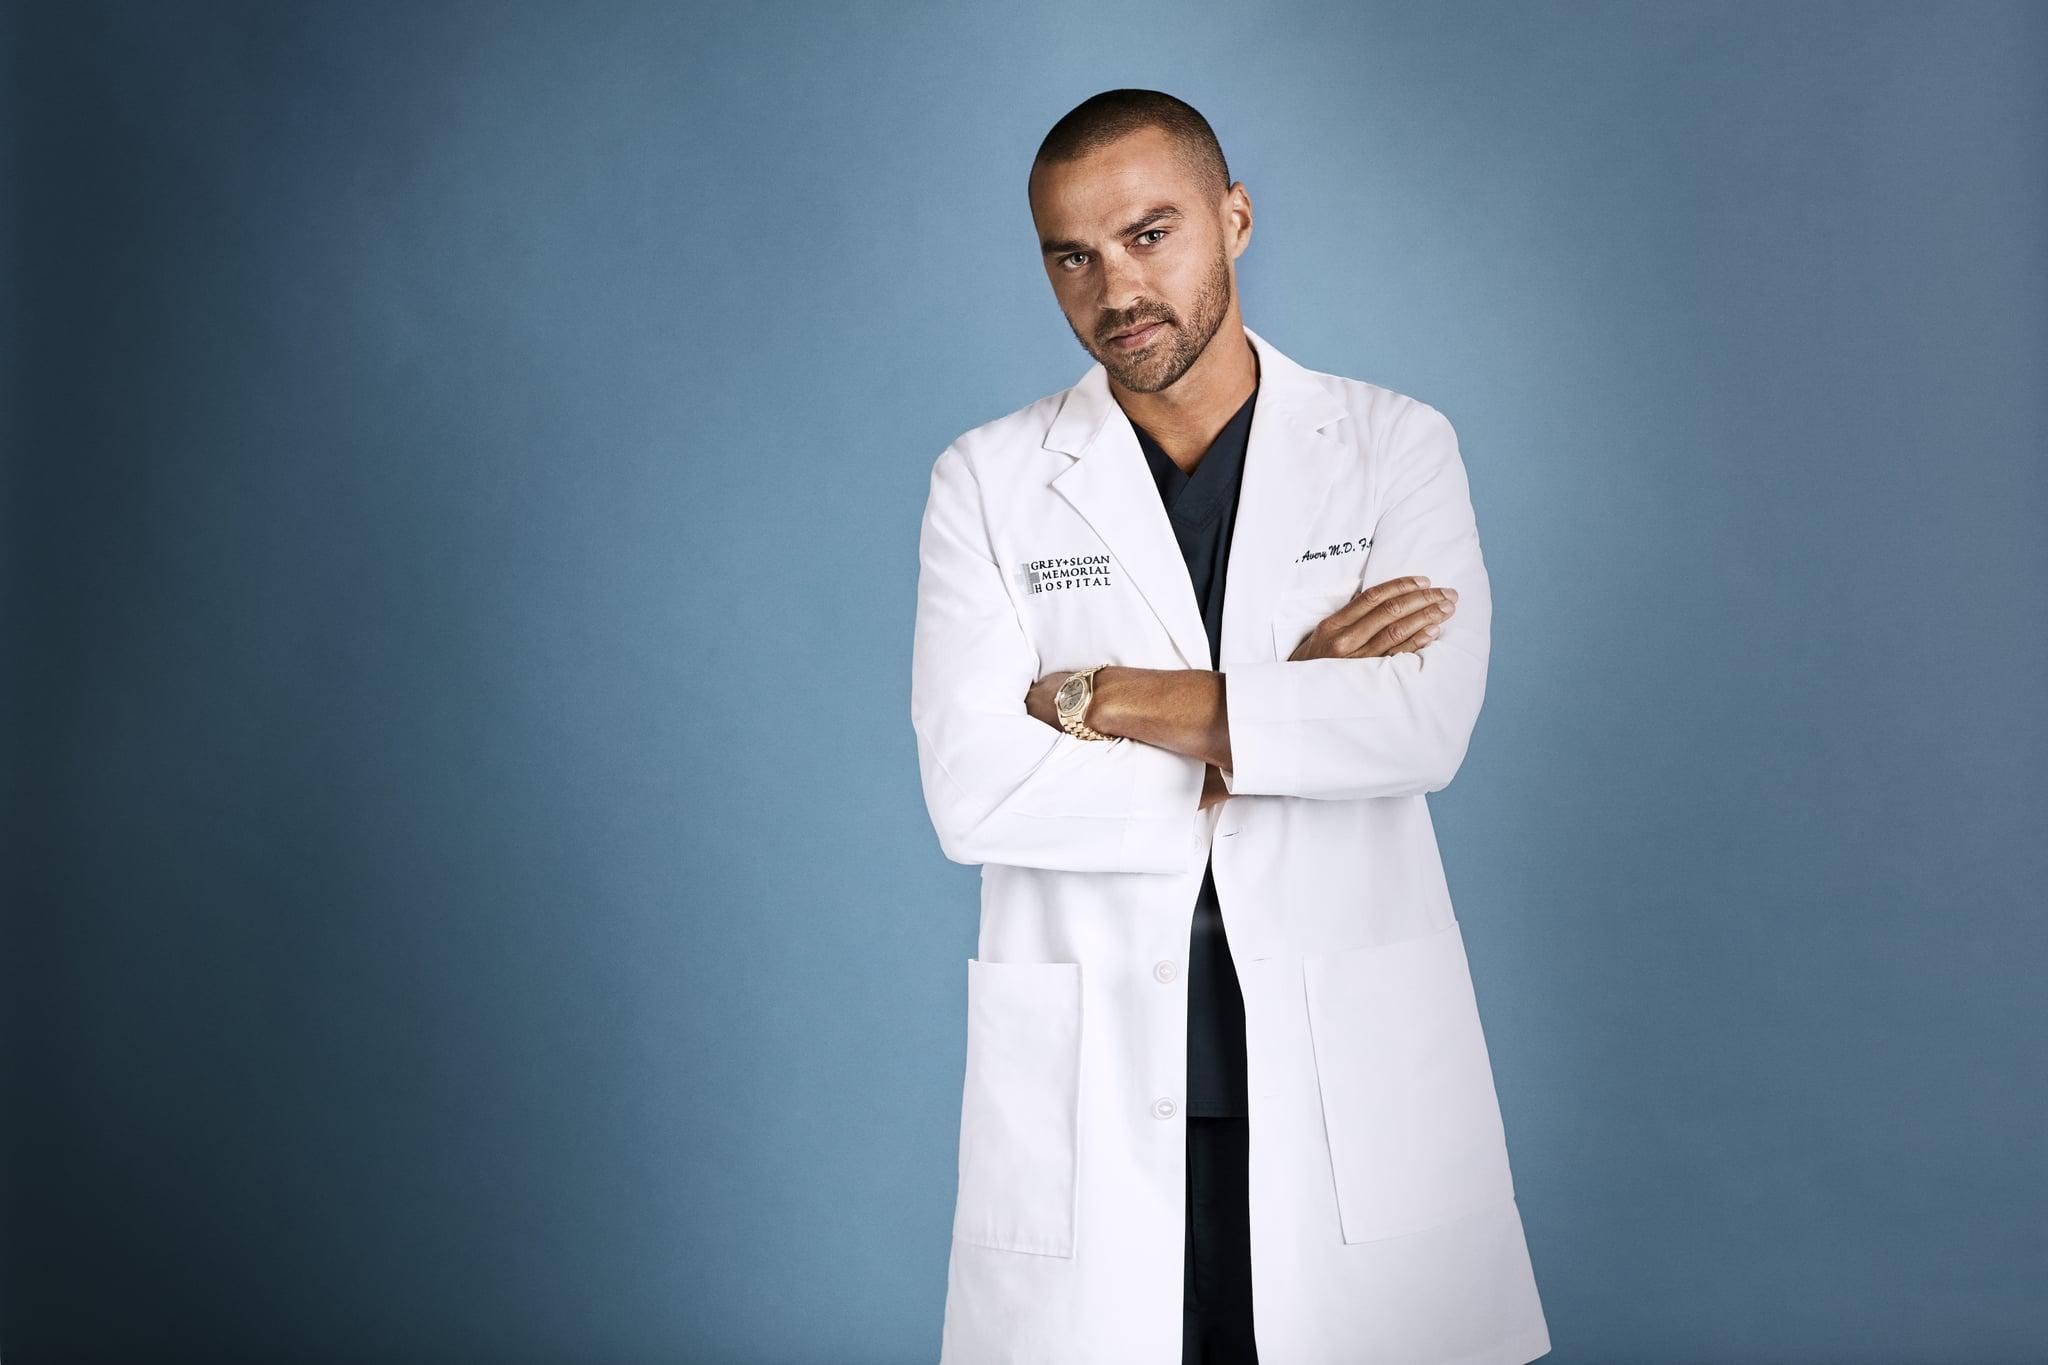 GREYS ANATOMY - ABCs Greys Anatomy stars Jesse Williams as Jackson Avery. (ABC/Mike Rosenthal)JESSE WILLIAMS